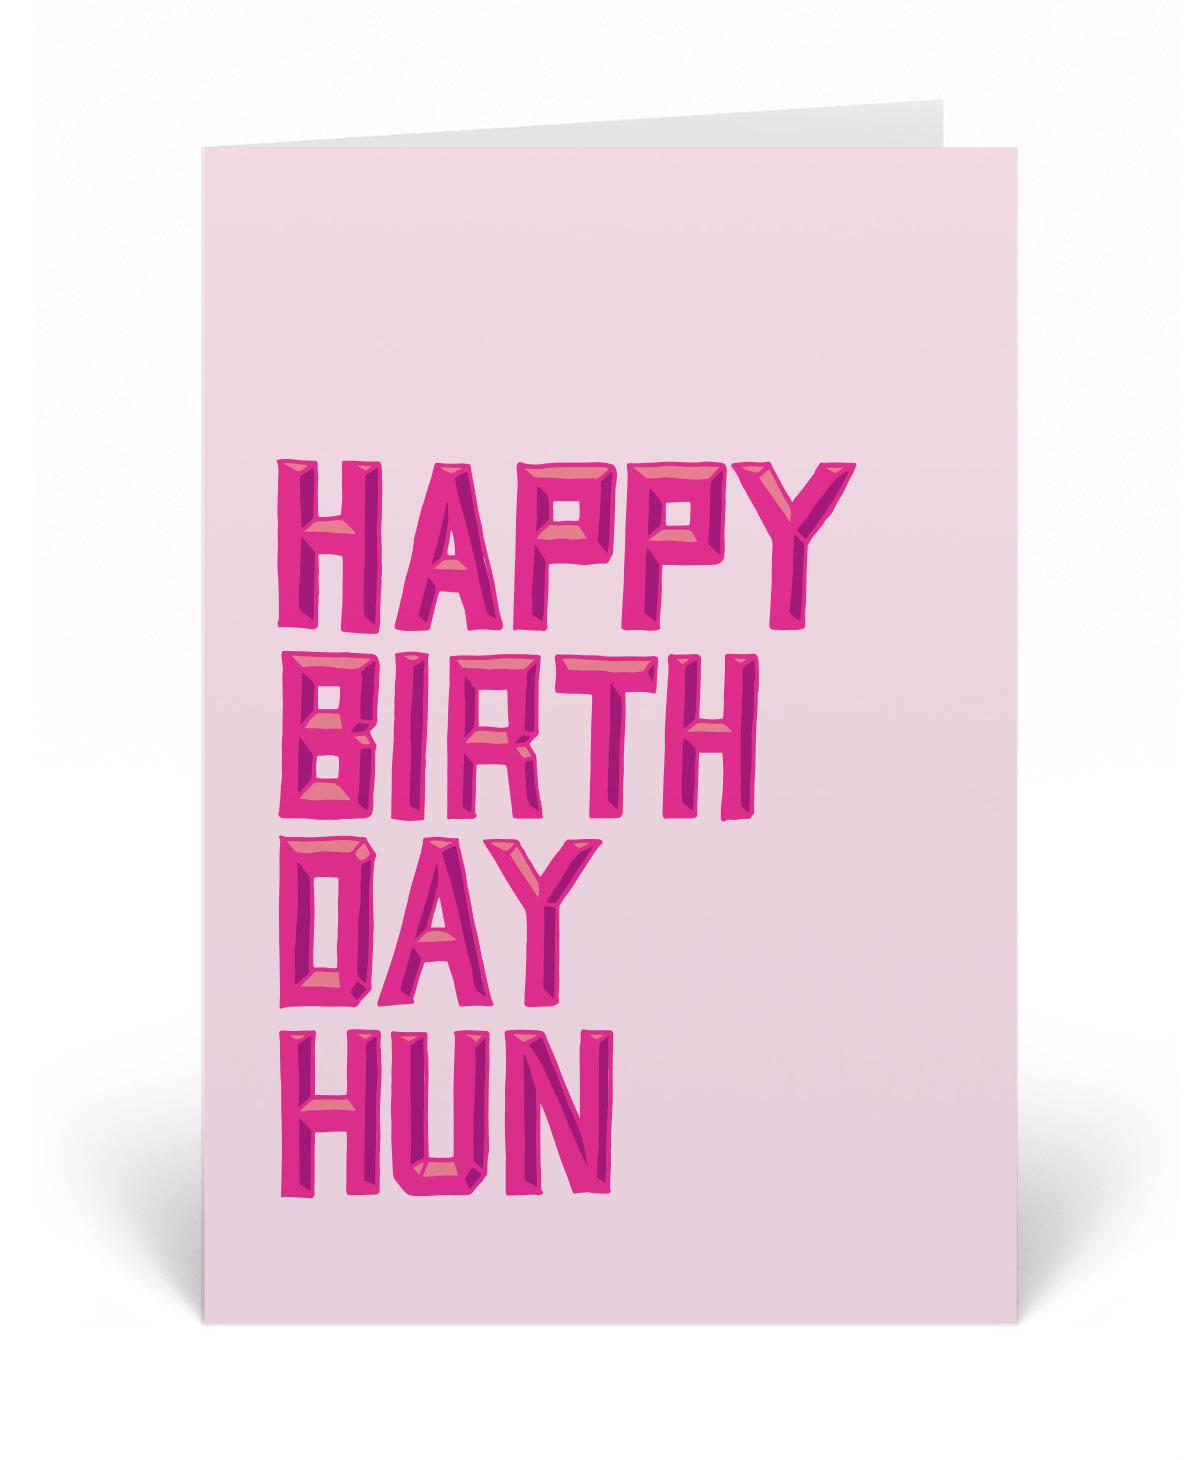 Happy Birthday Hun Greetings Card